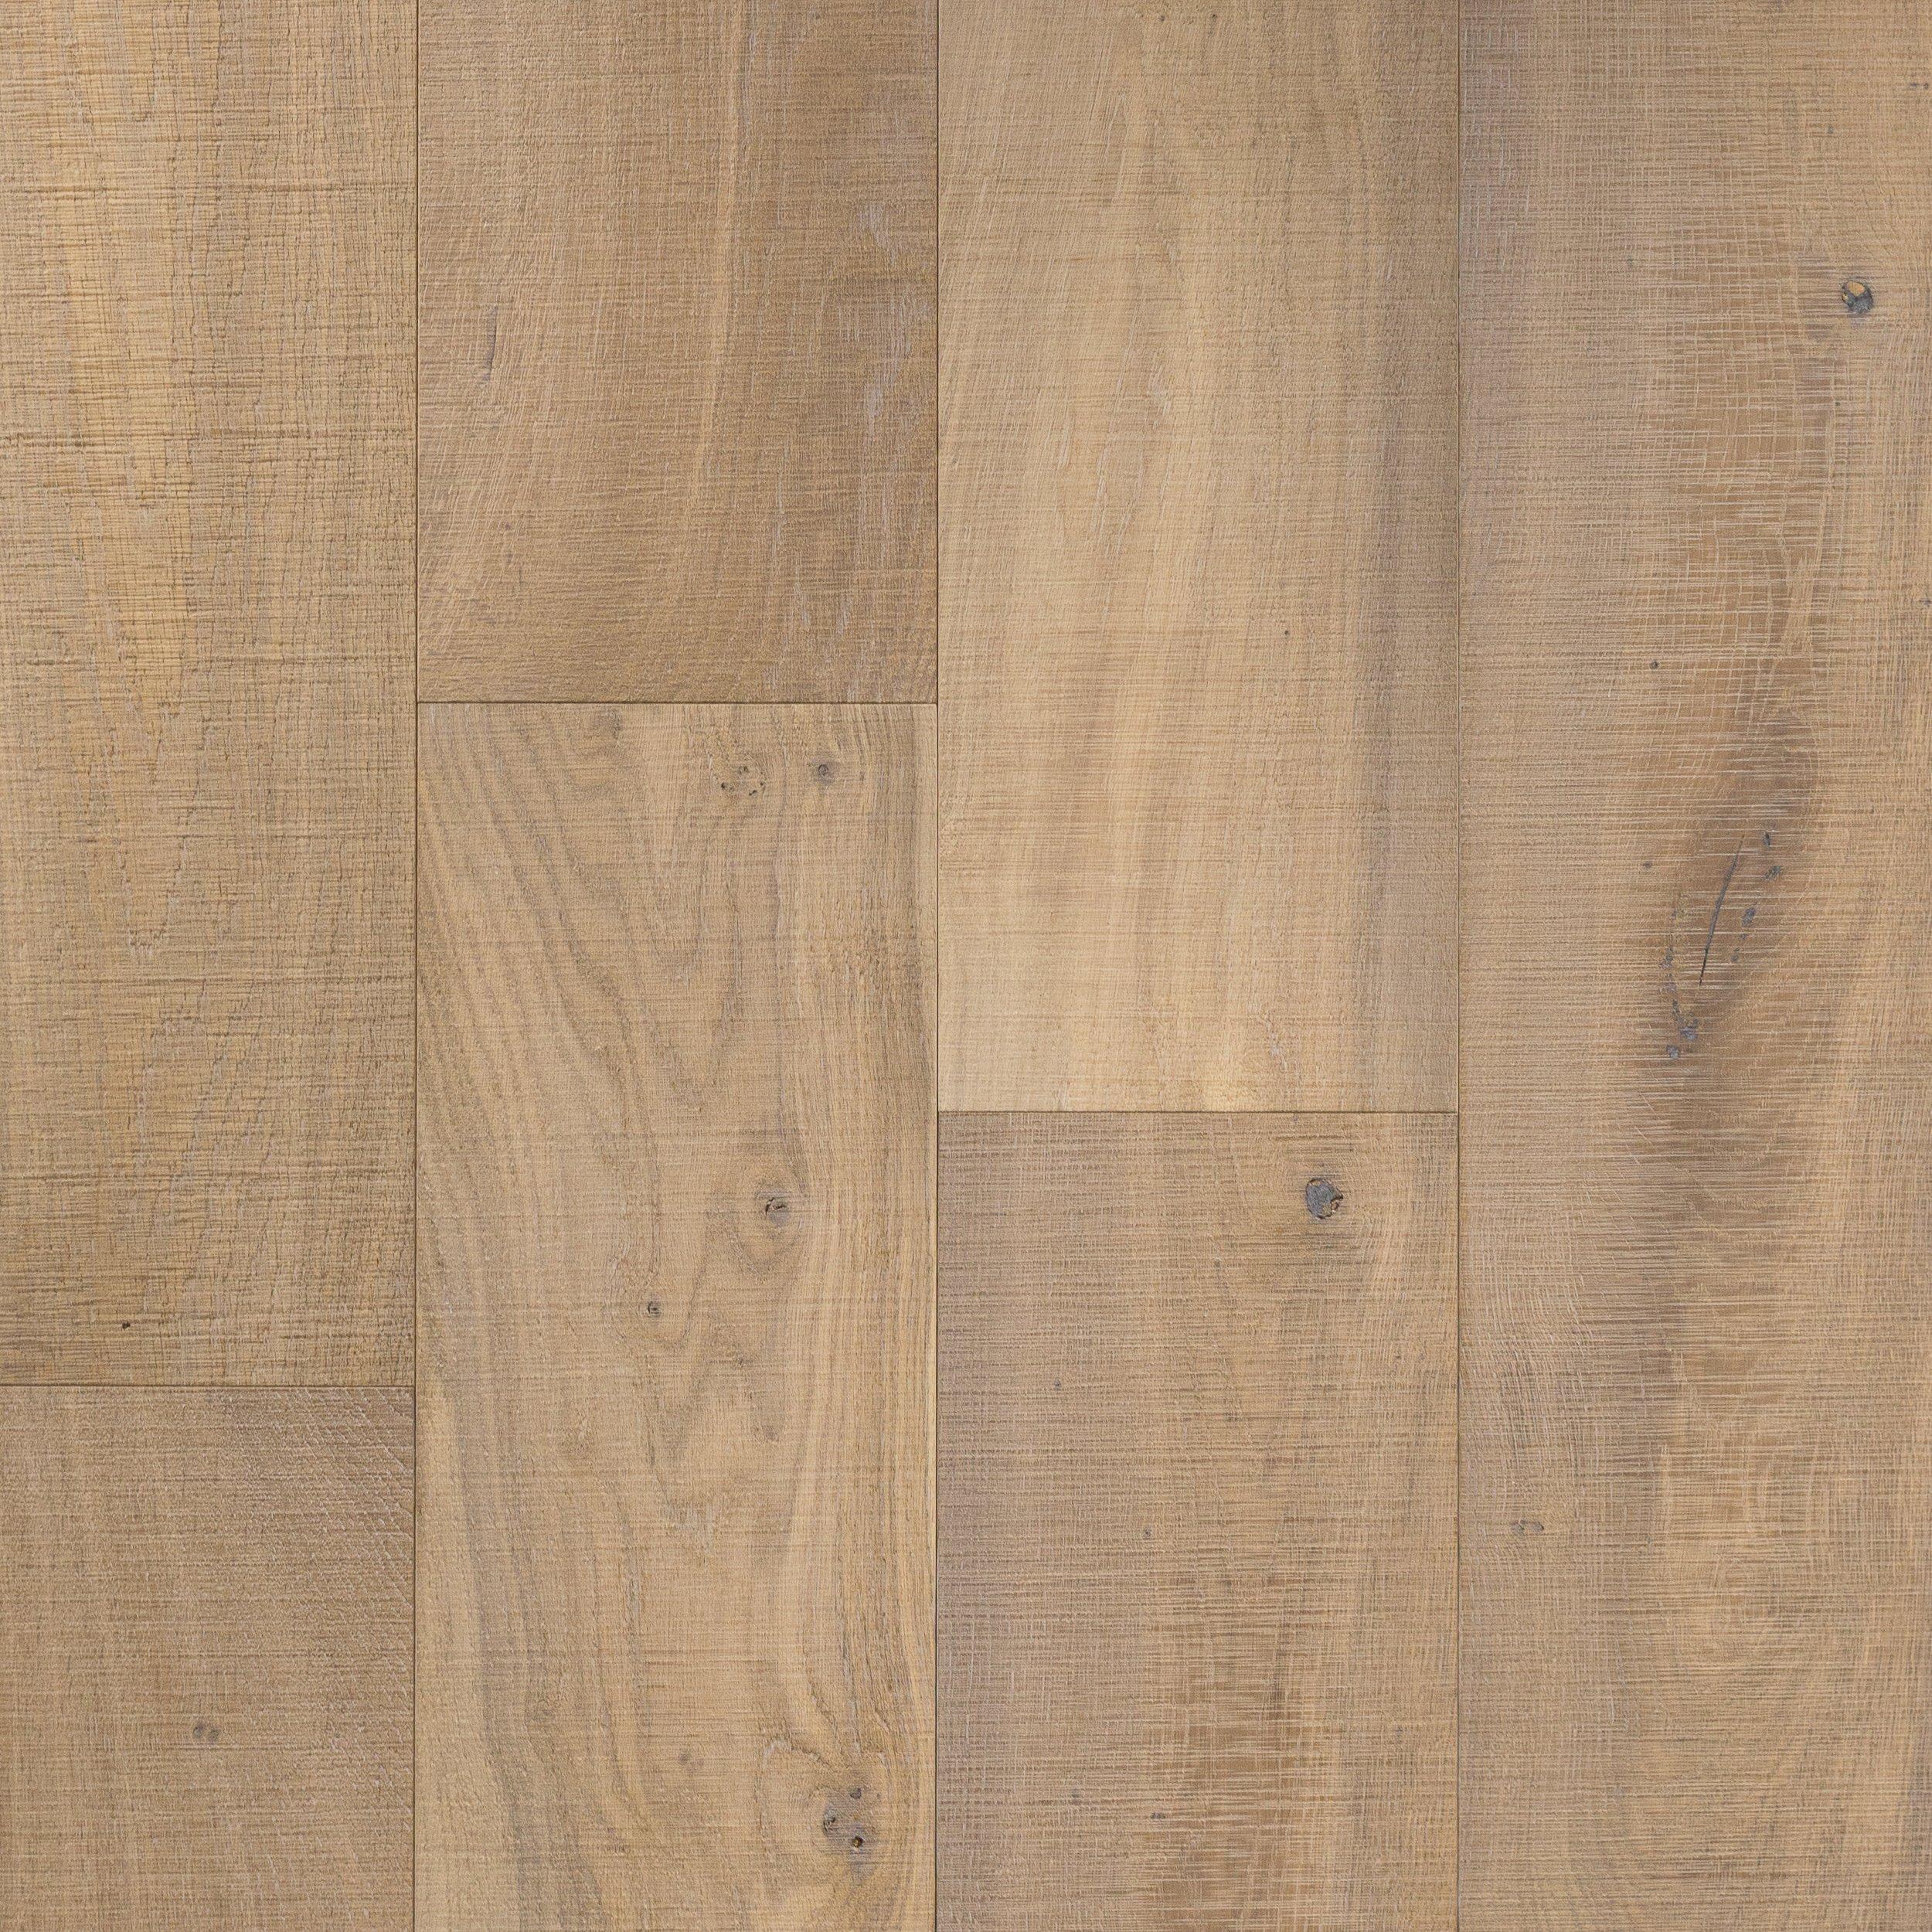 Delicieux Montpellier Oak Distressed Engineered Hardwood